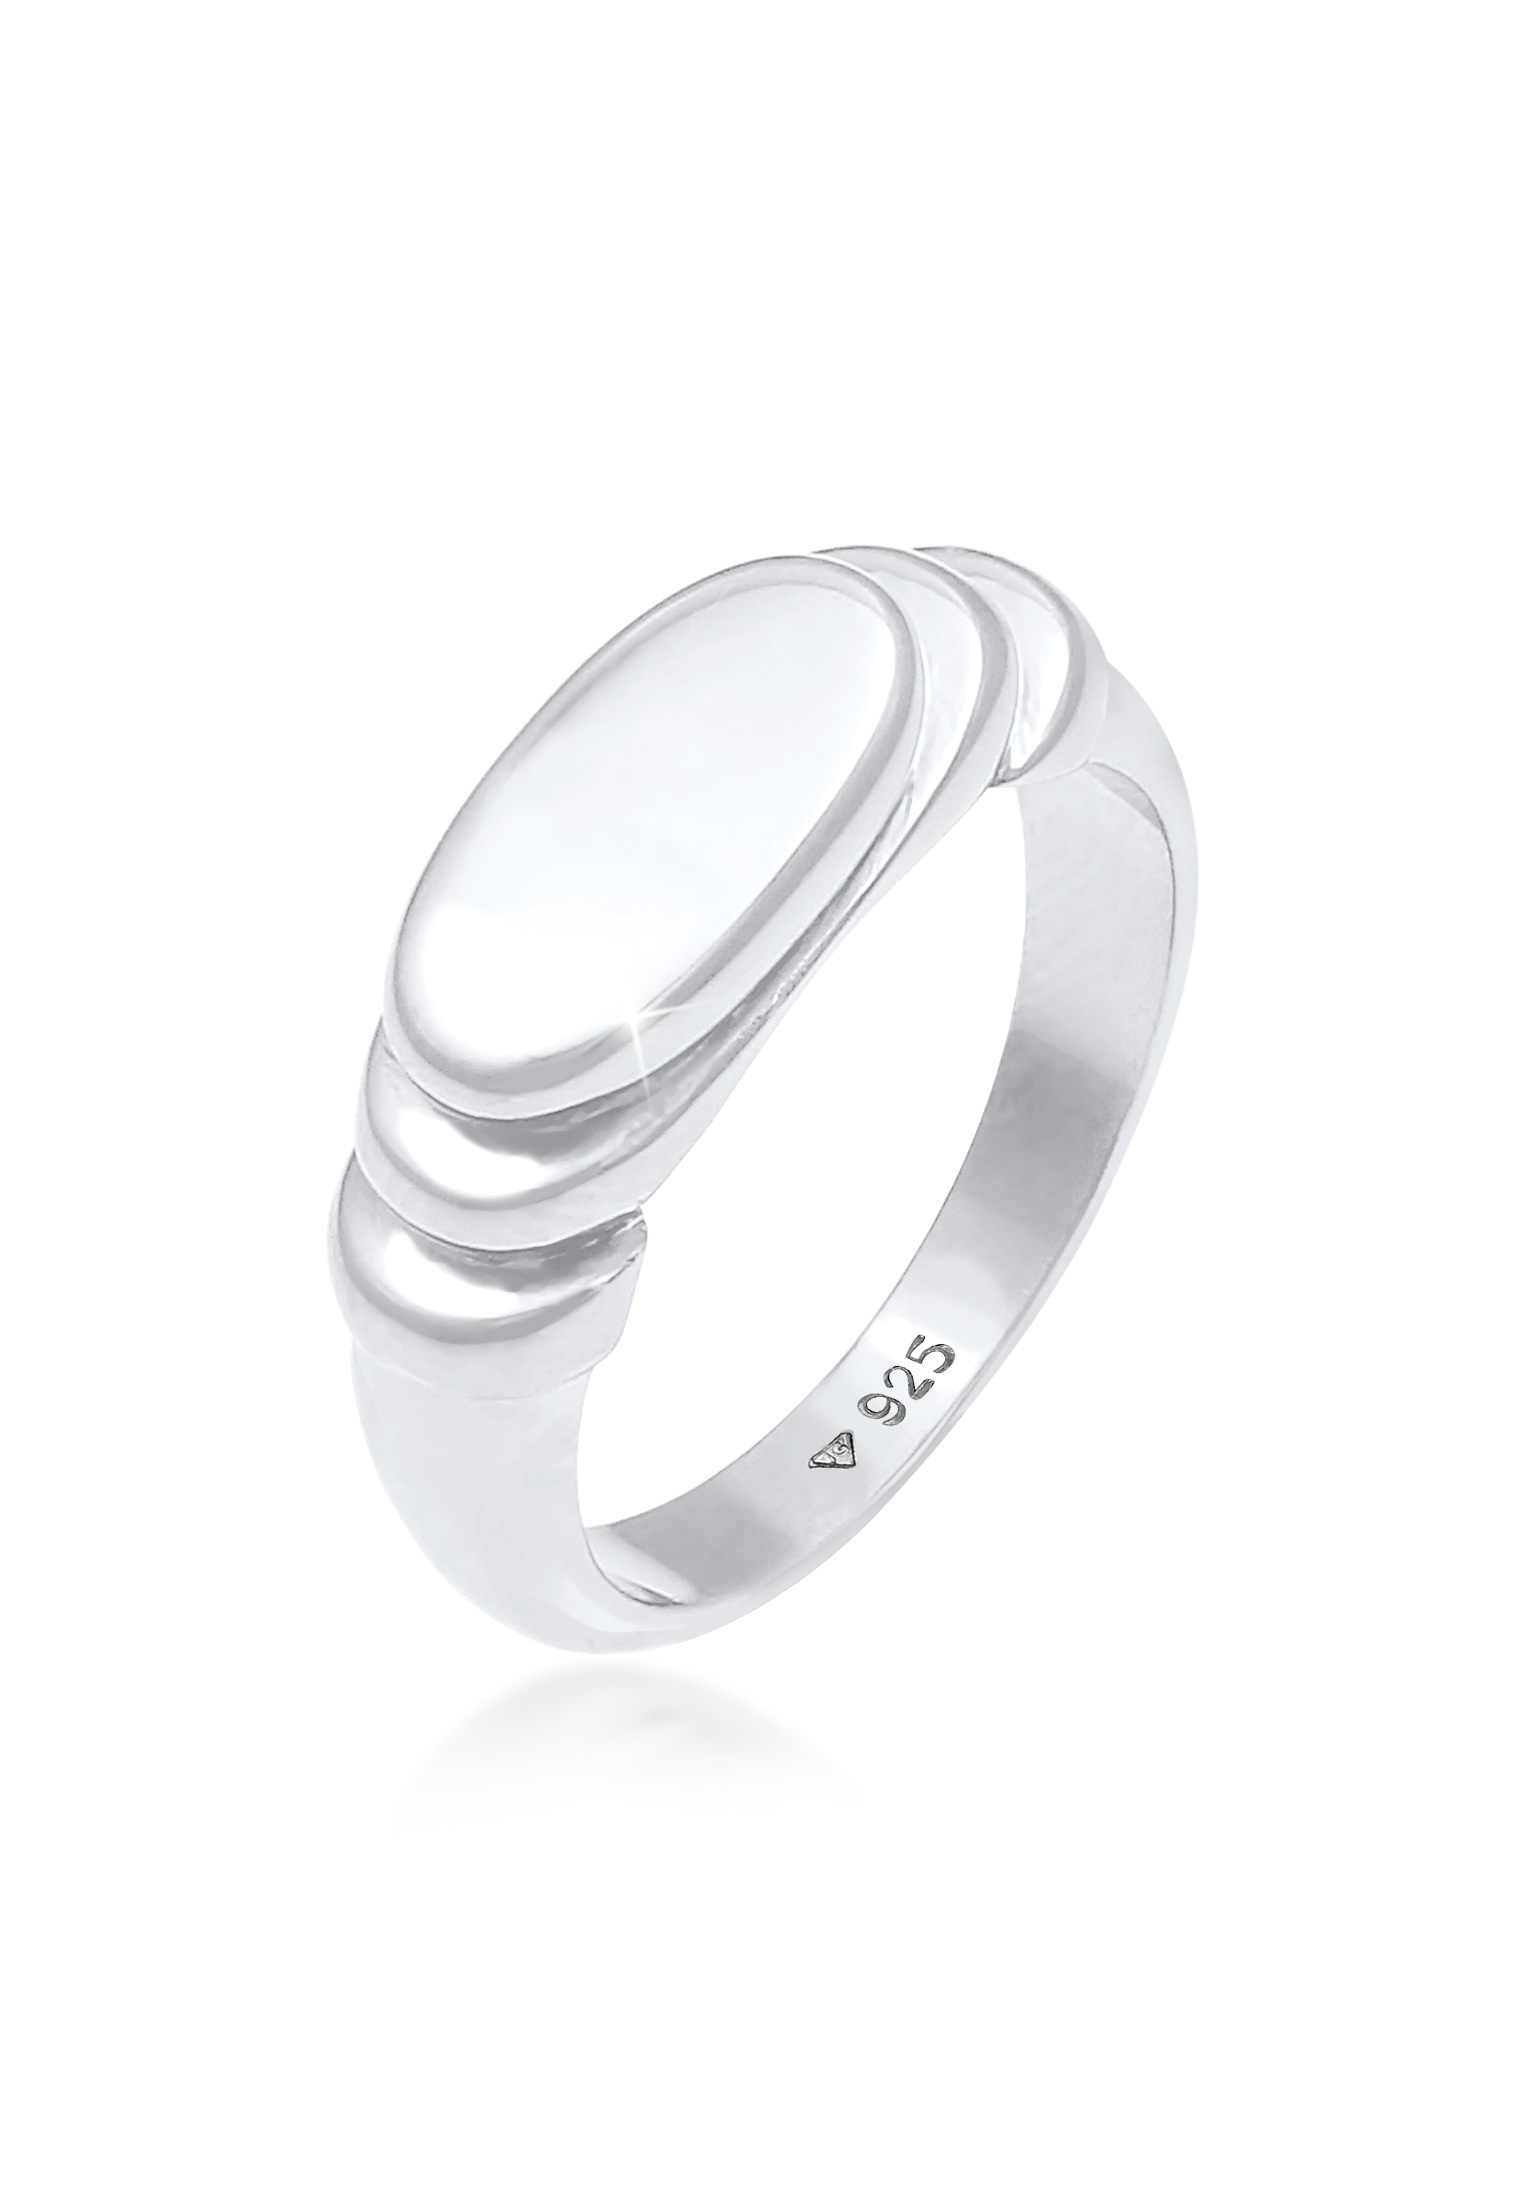 Siegelring | 925er Sterling Silber